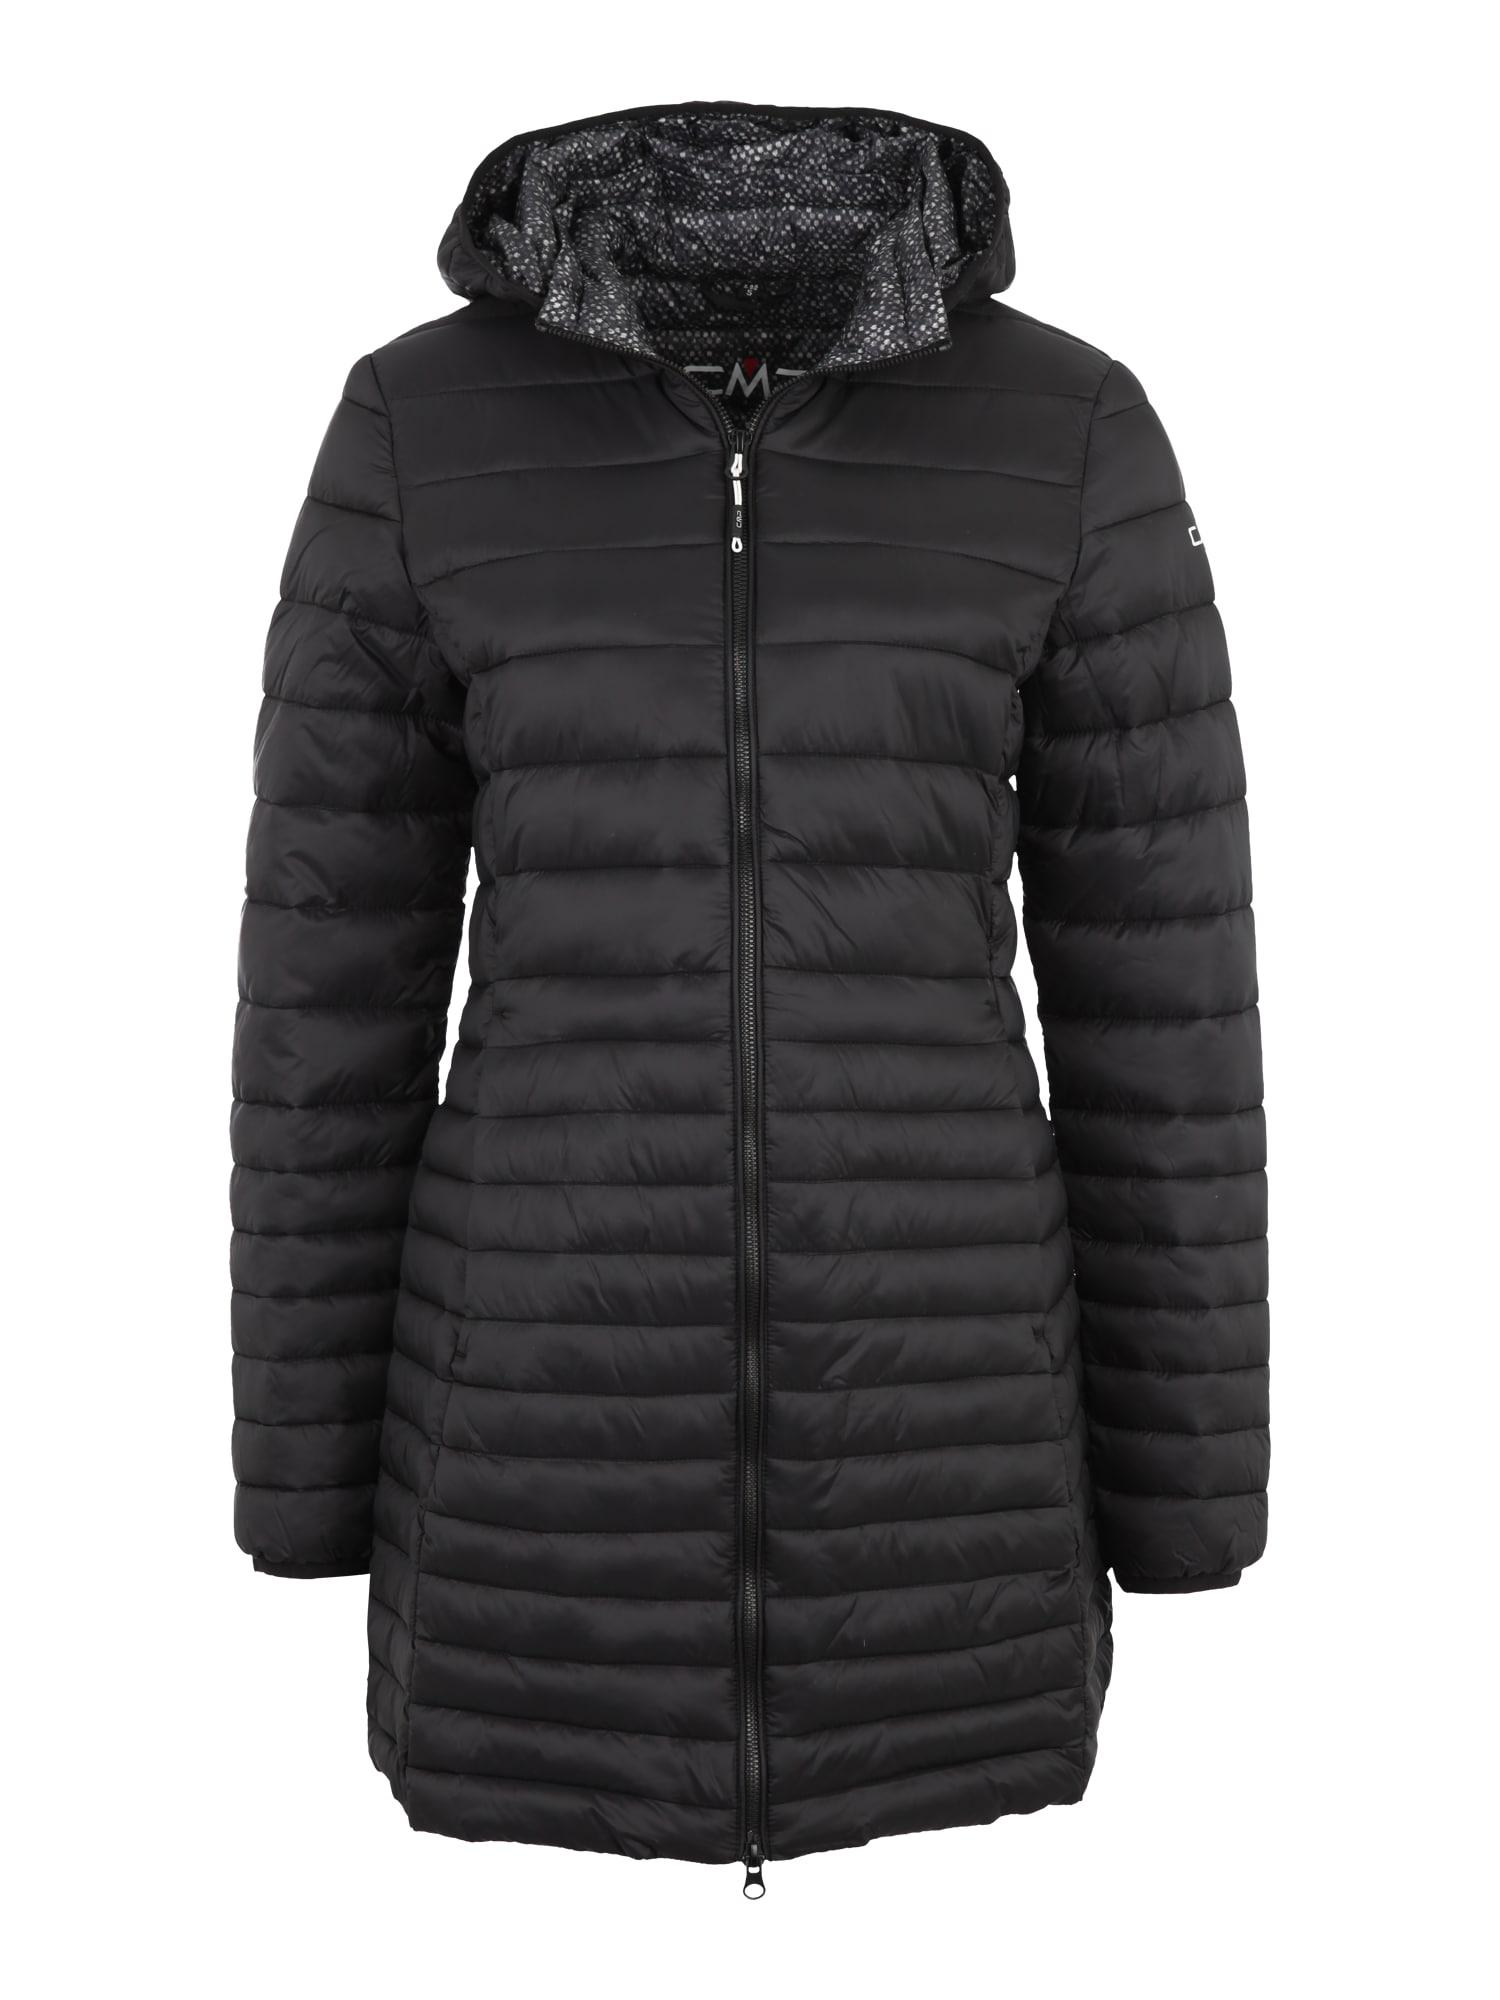 Outdoorový kabát FIX HOOD černá CMP